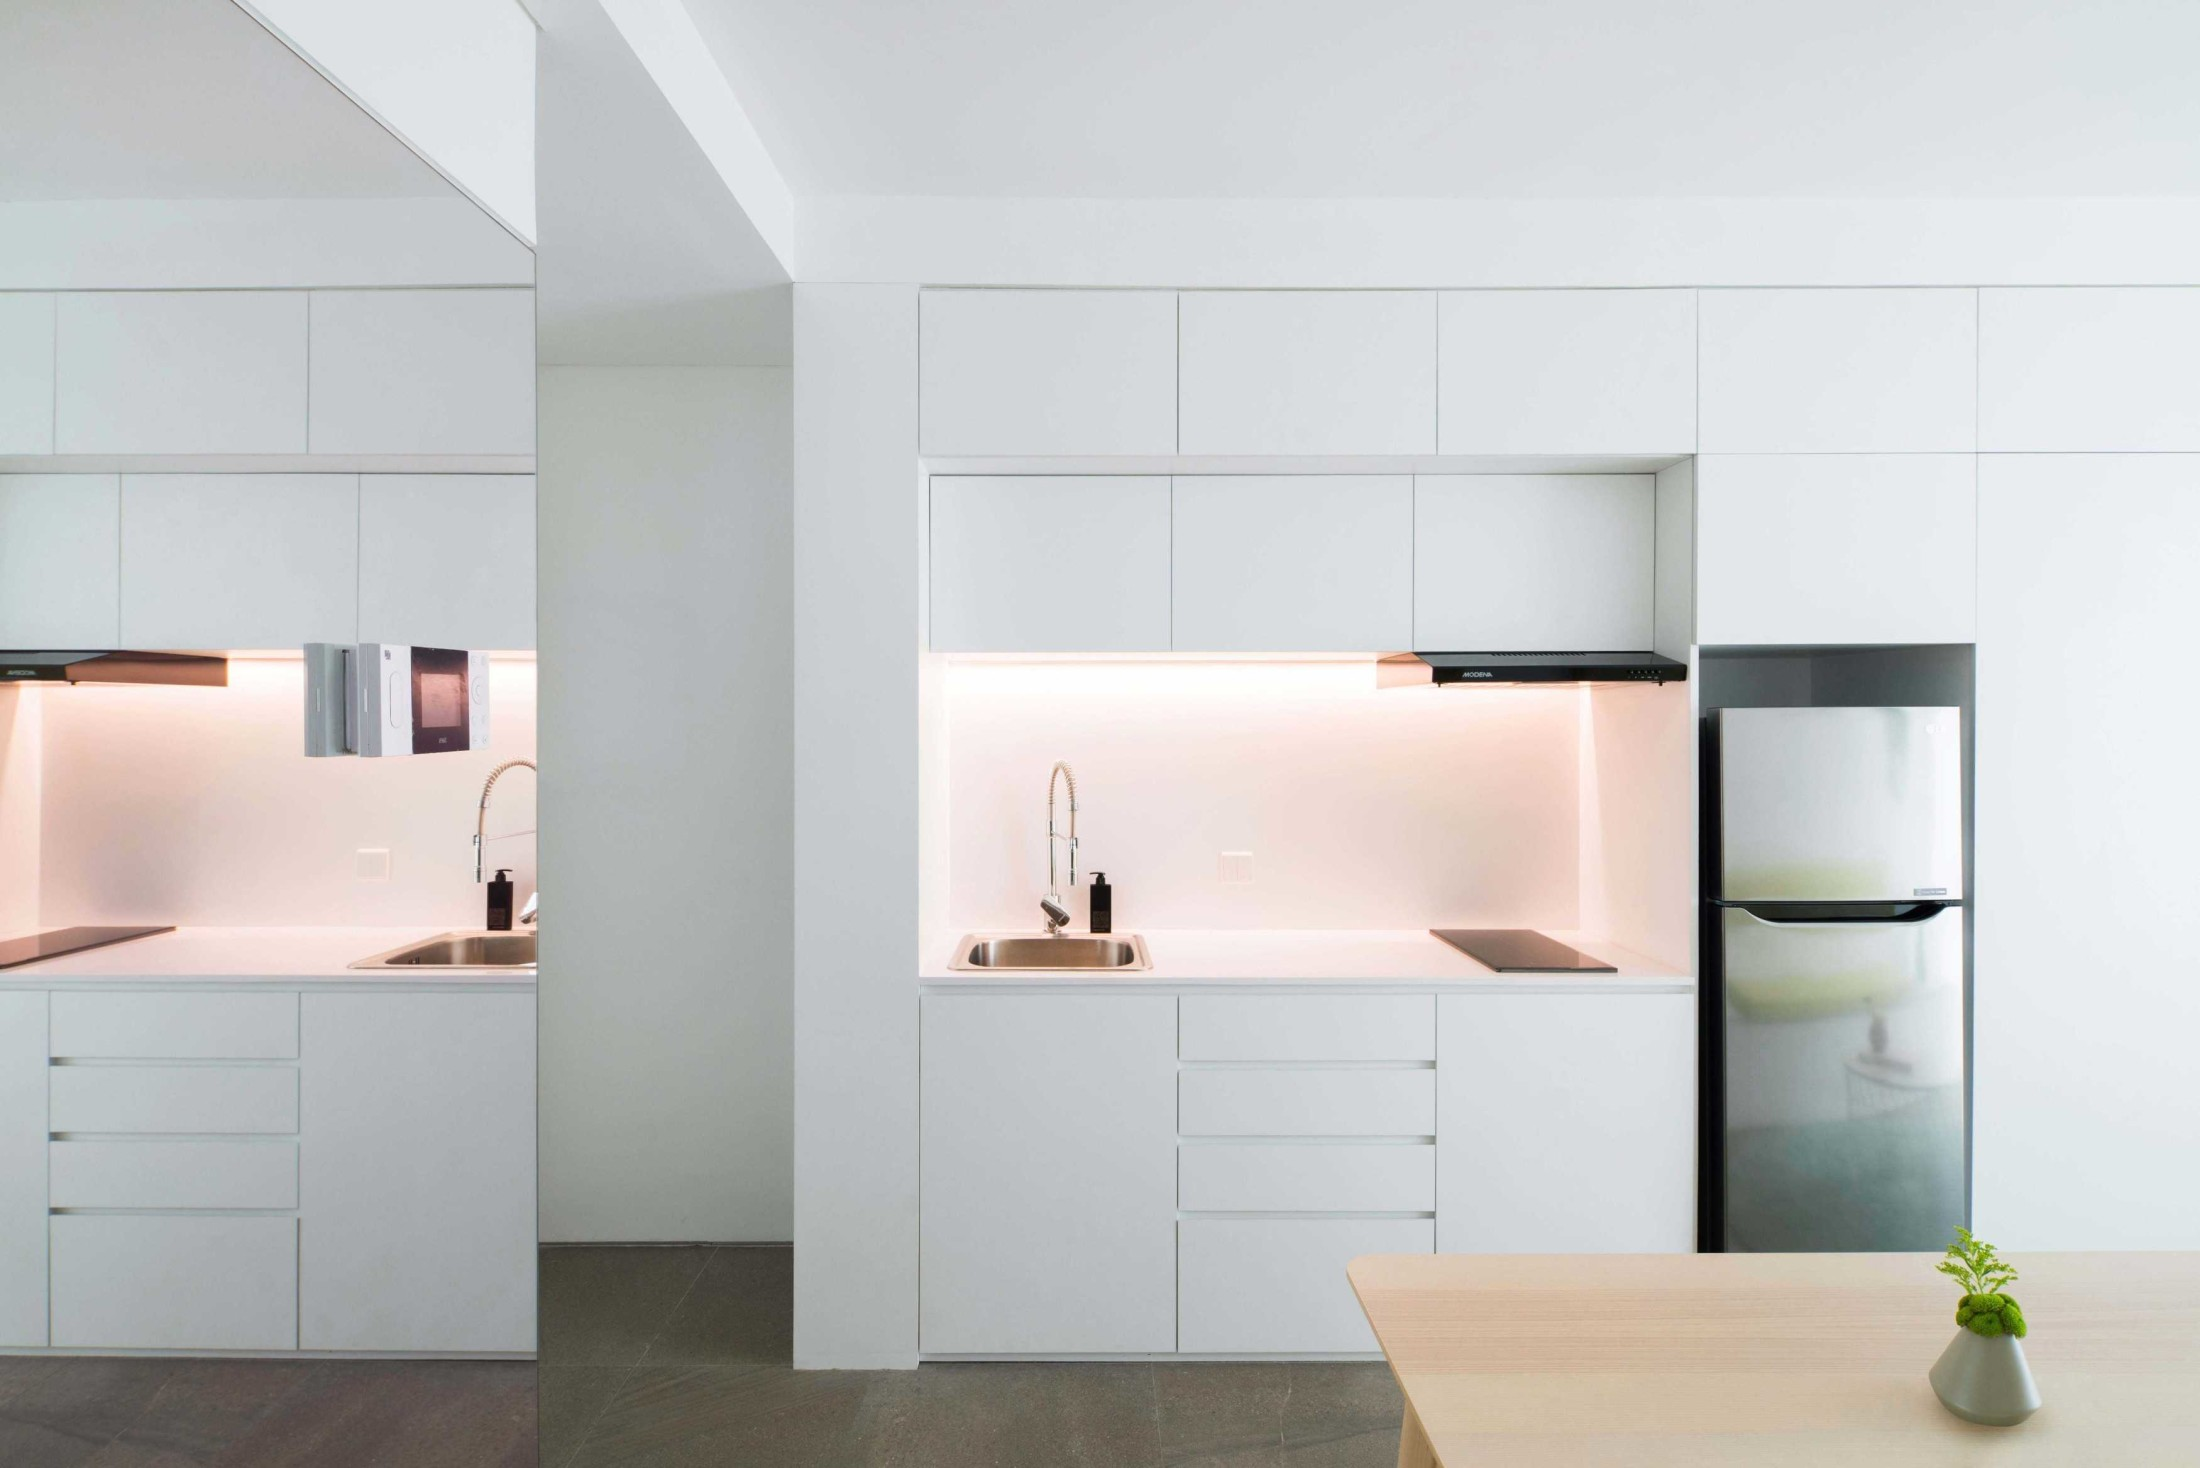 Dapur kecil yang lengkap (Sumber: Arsitag.com)